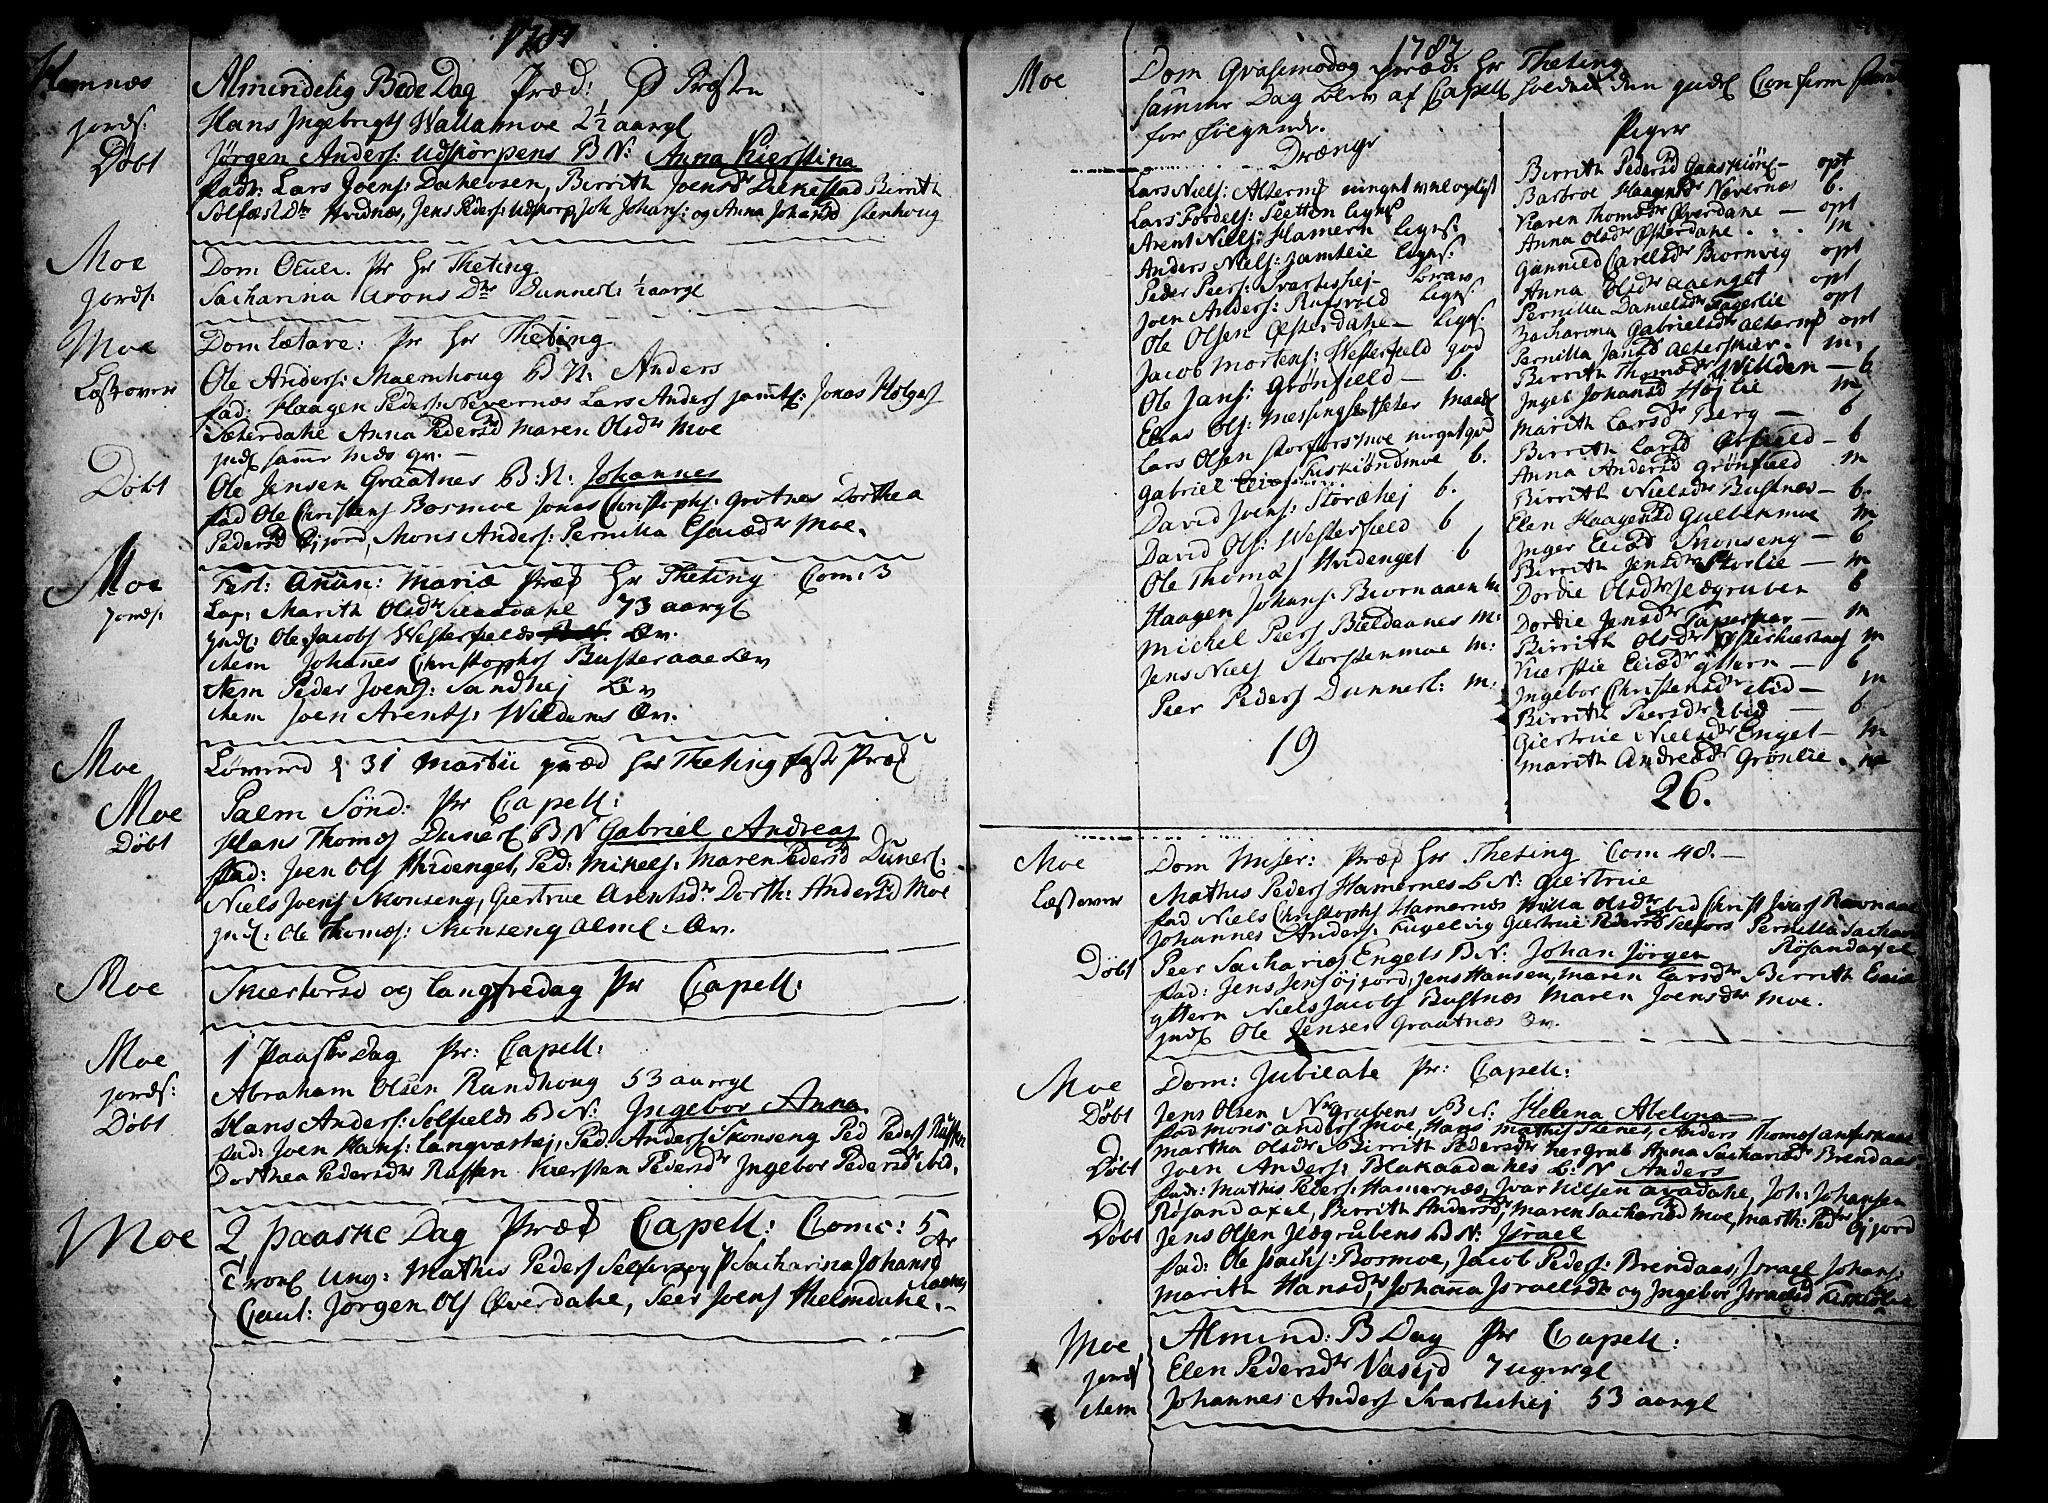 SAT, Ministerialprotokoller, klokkerbøker og fødselsregistre - Nordland, 825/L0348: Ministerialbok nr. 825A04, 1752-1788, s. 359